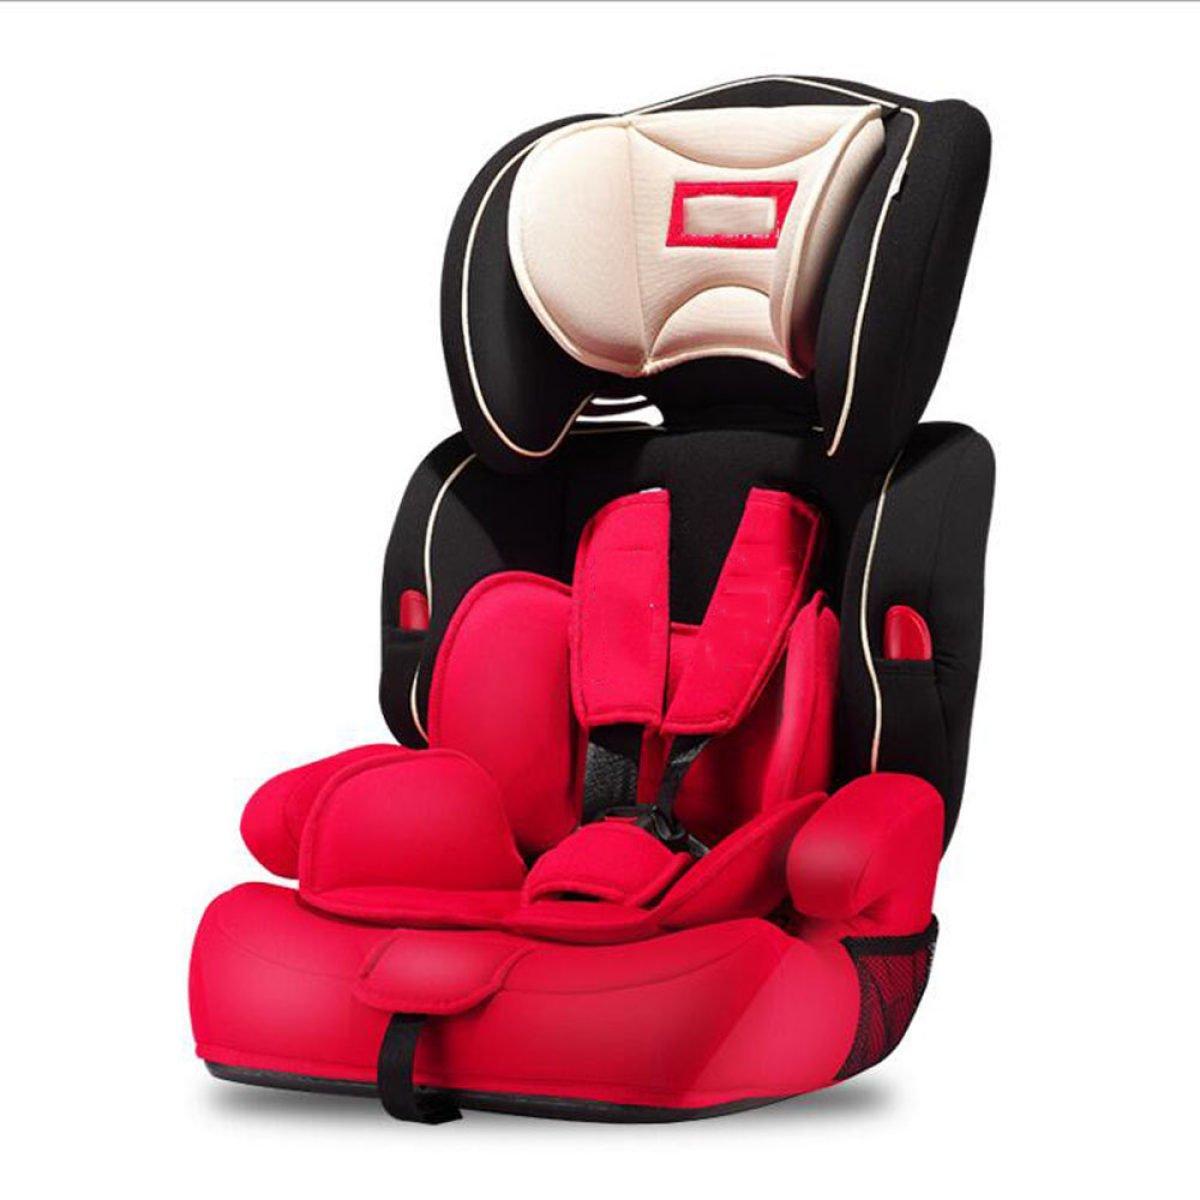 Komfort-Kindersitz Beweglicher Babyautokindersitze